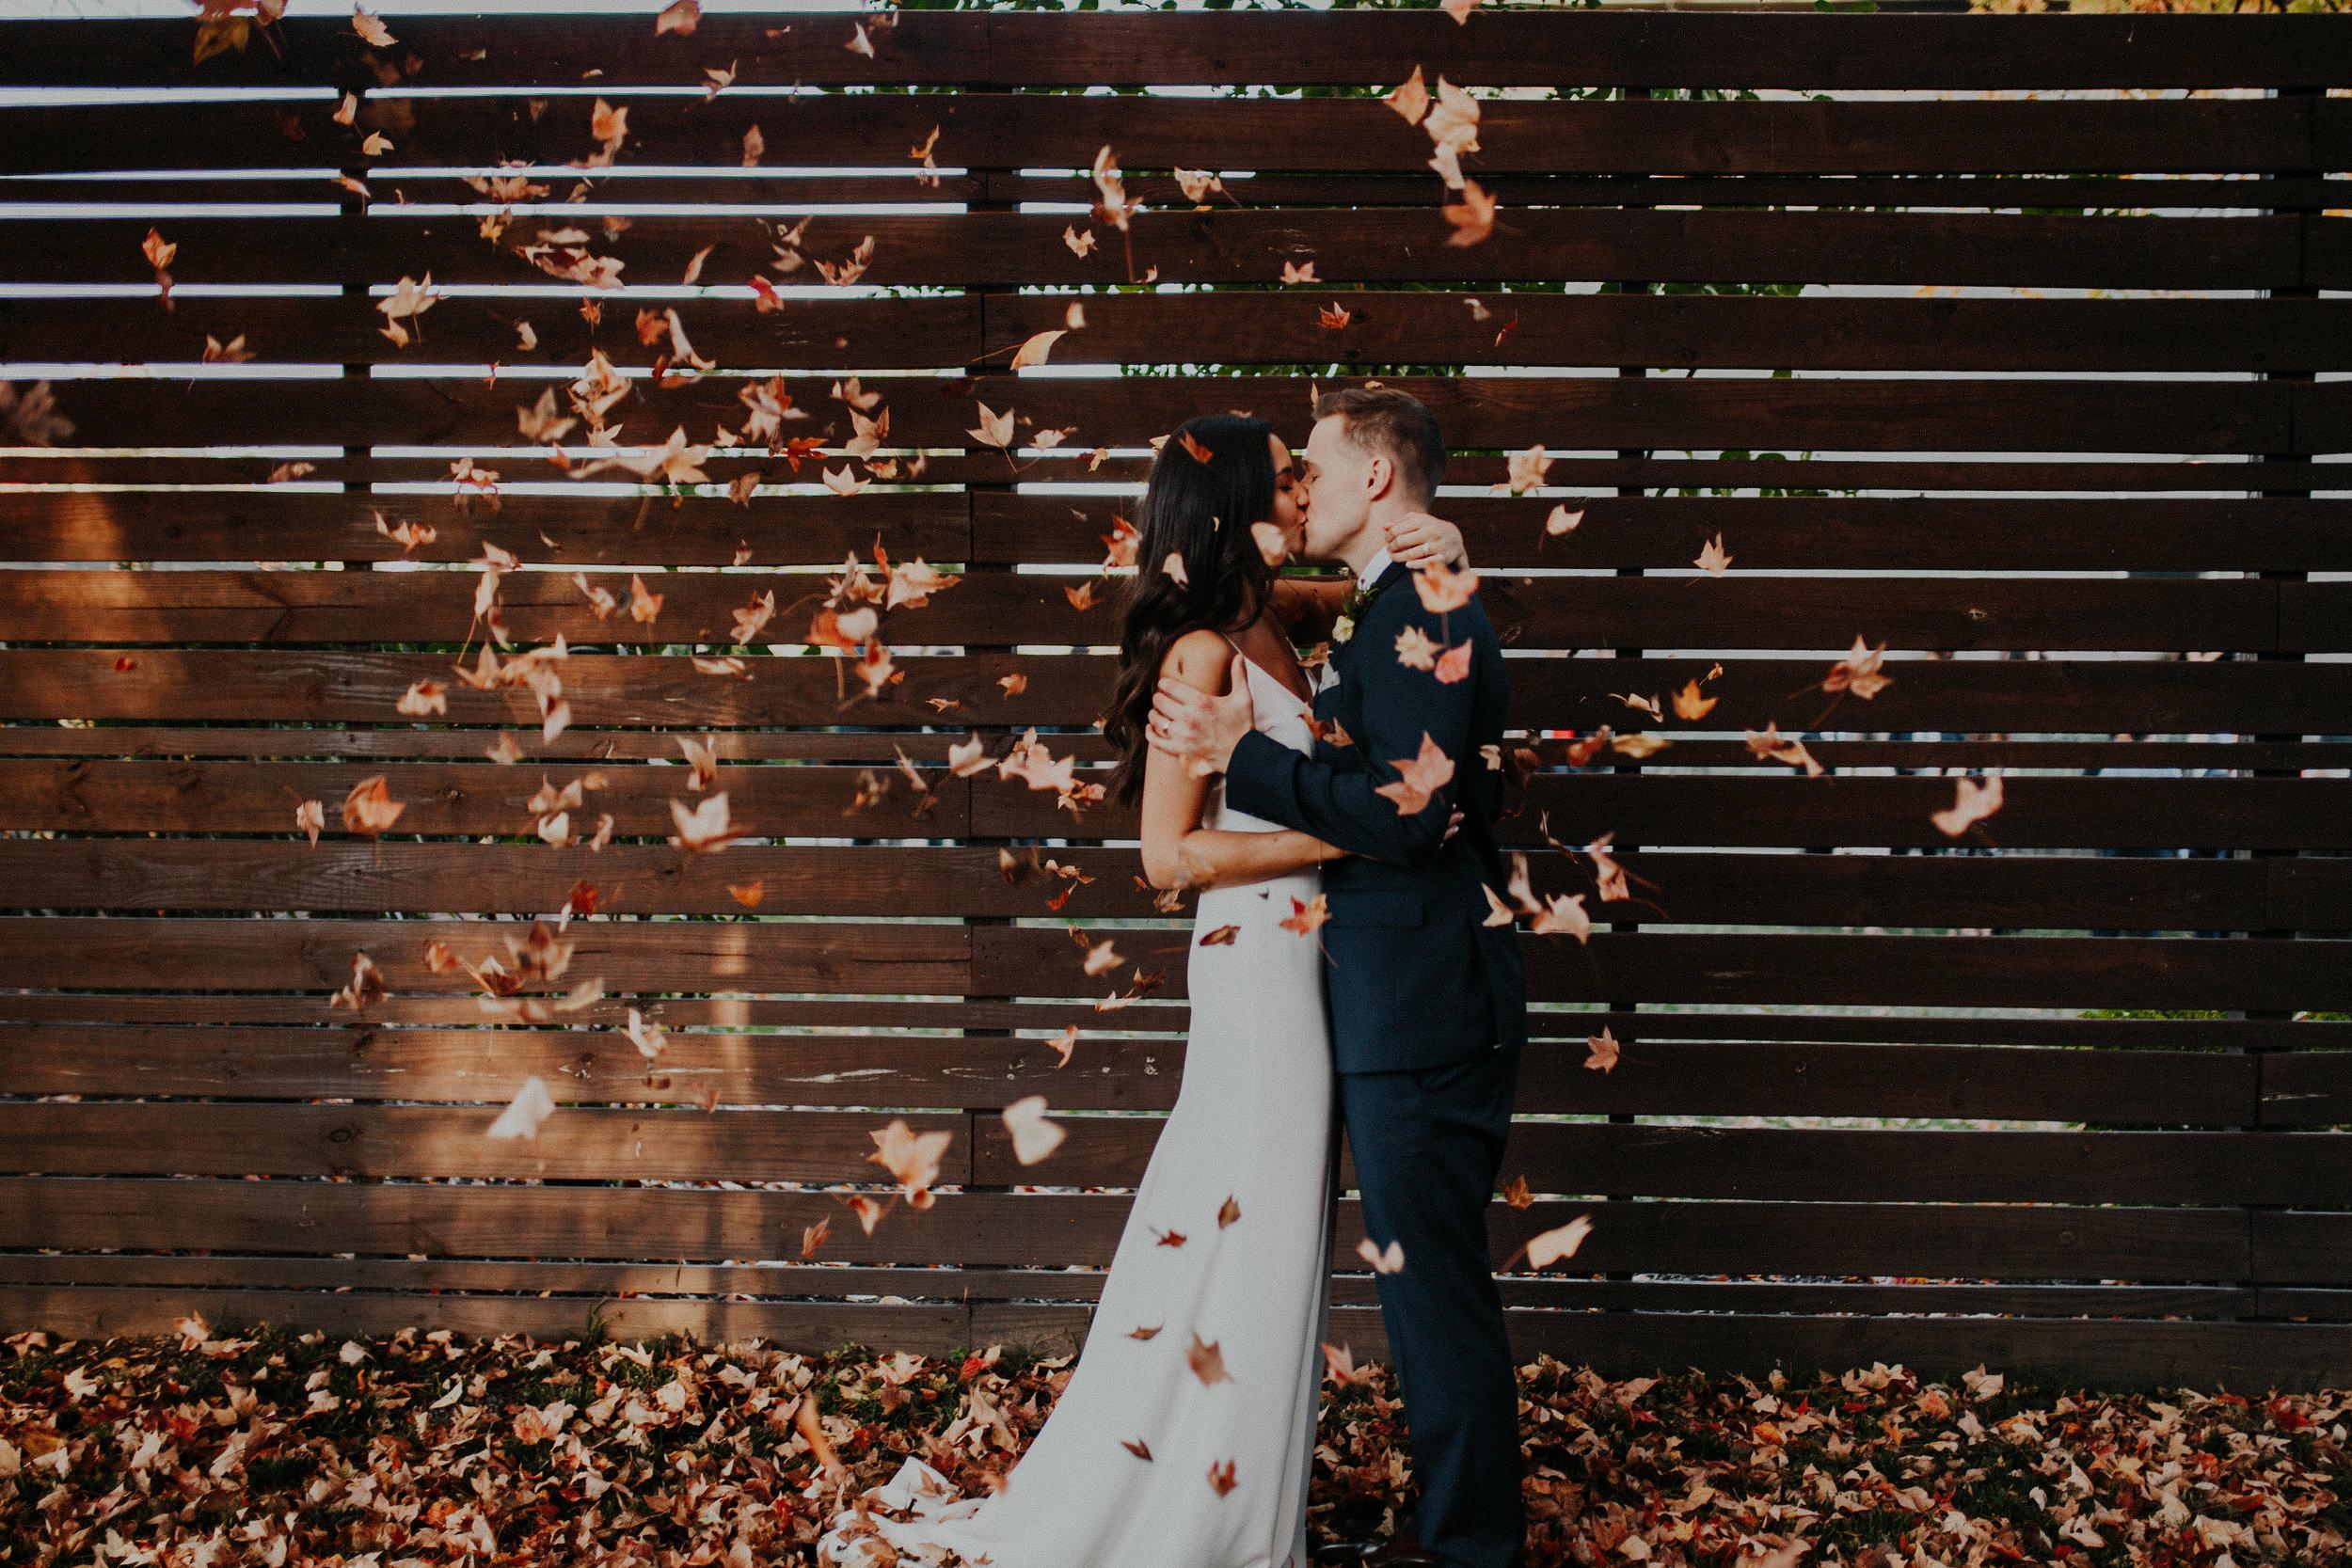 ALLD_thomas_wedding-693.JPG